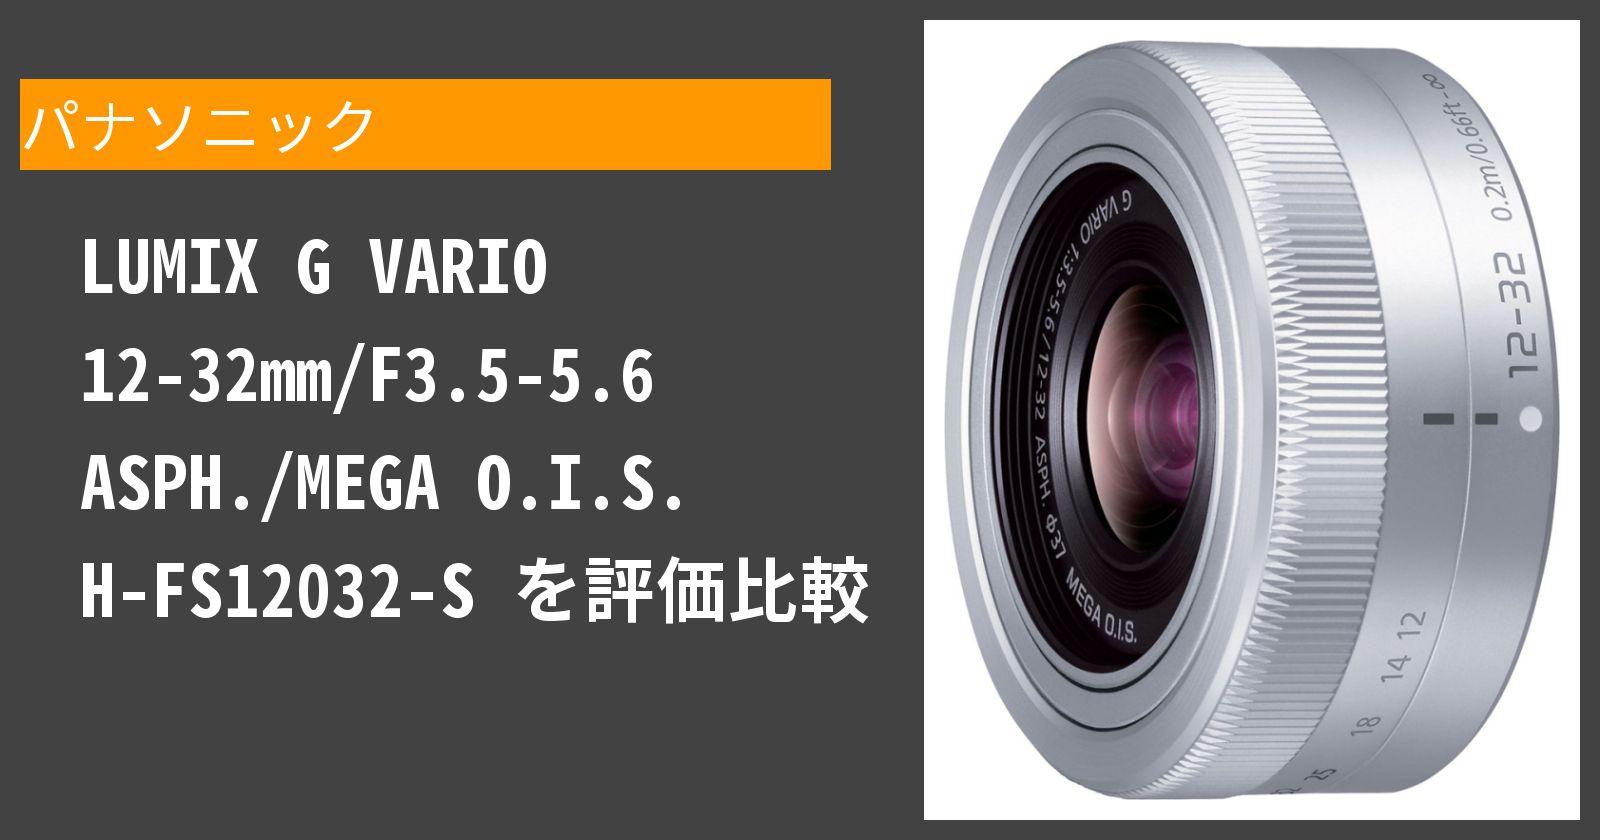 LUMIX G VARIO 12-32mm/F3.5-5.6 ASPH./MEGA O.I.S. H-FS12032-Sを徹底評価